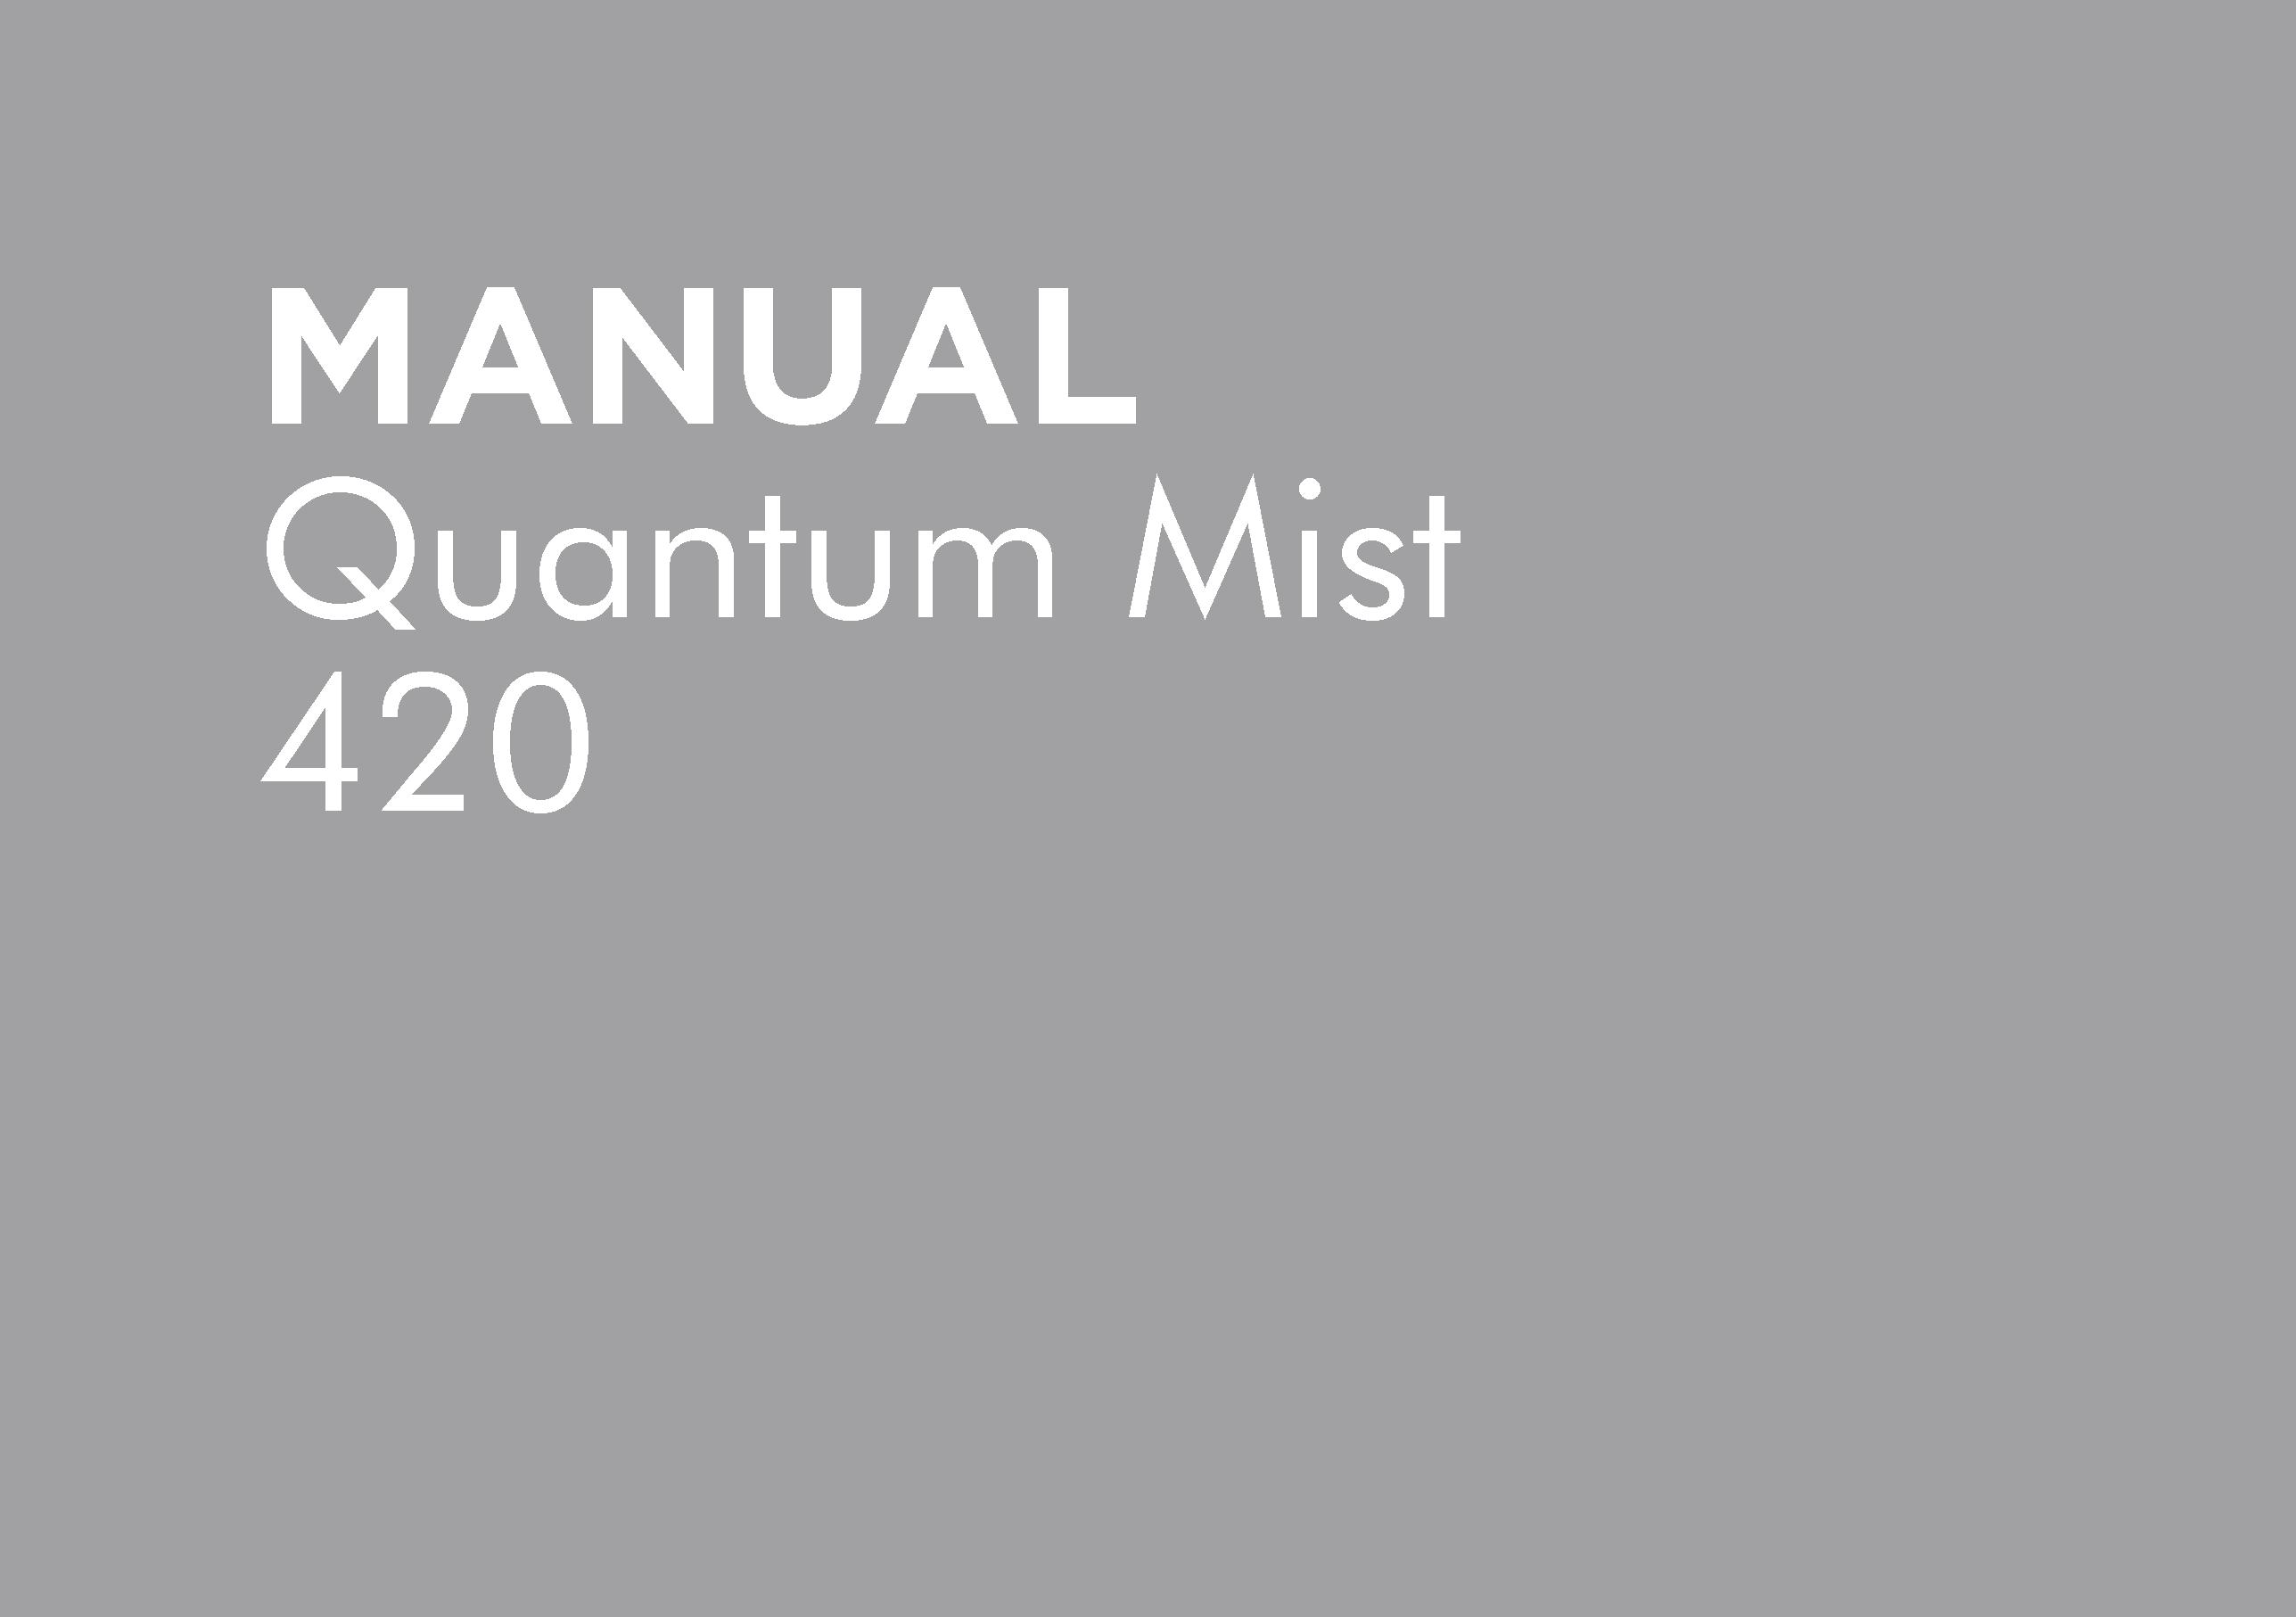 HT-OMQM420-A – QUANTUM MIST 420 SPRAYERS_WEB